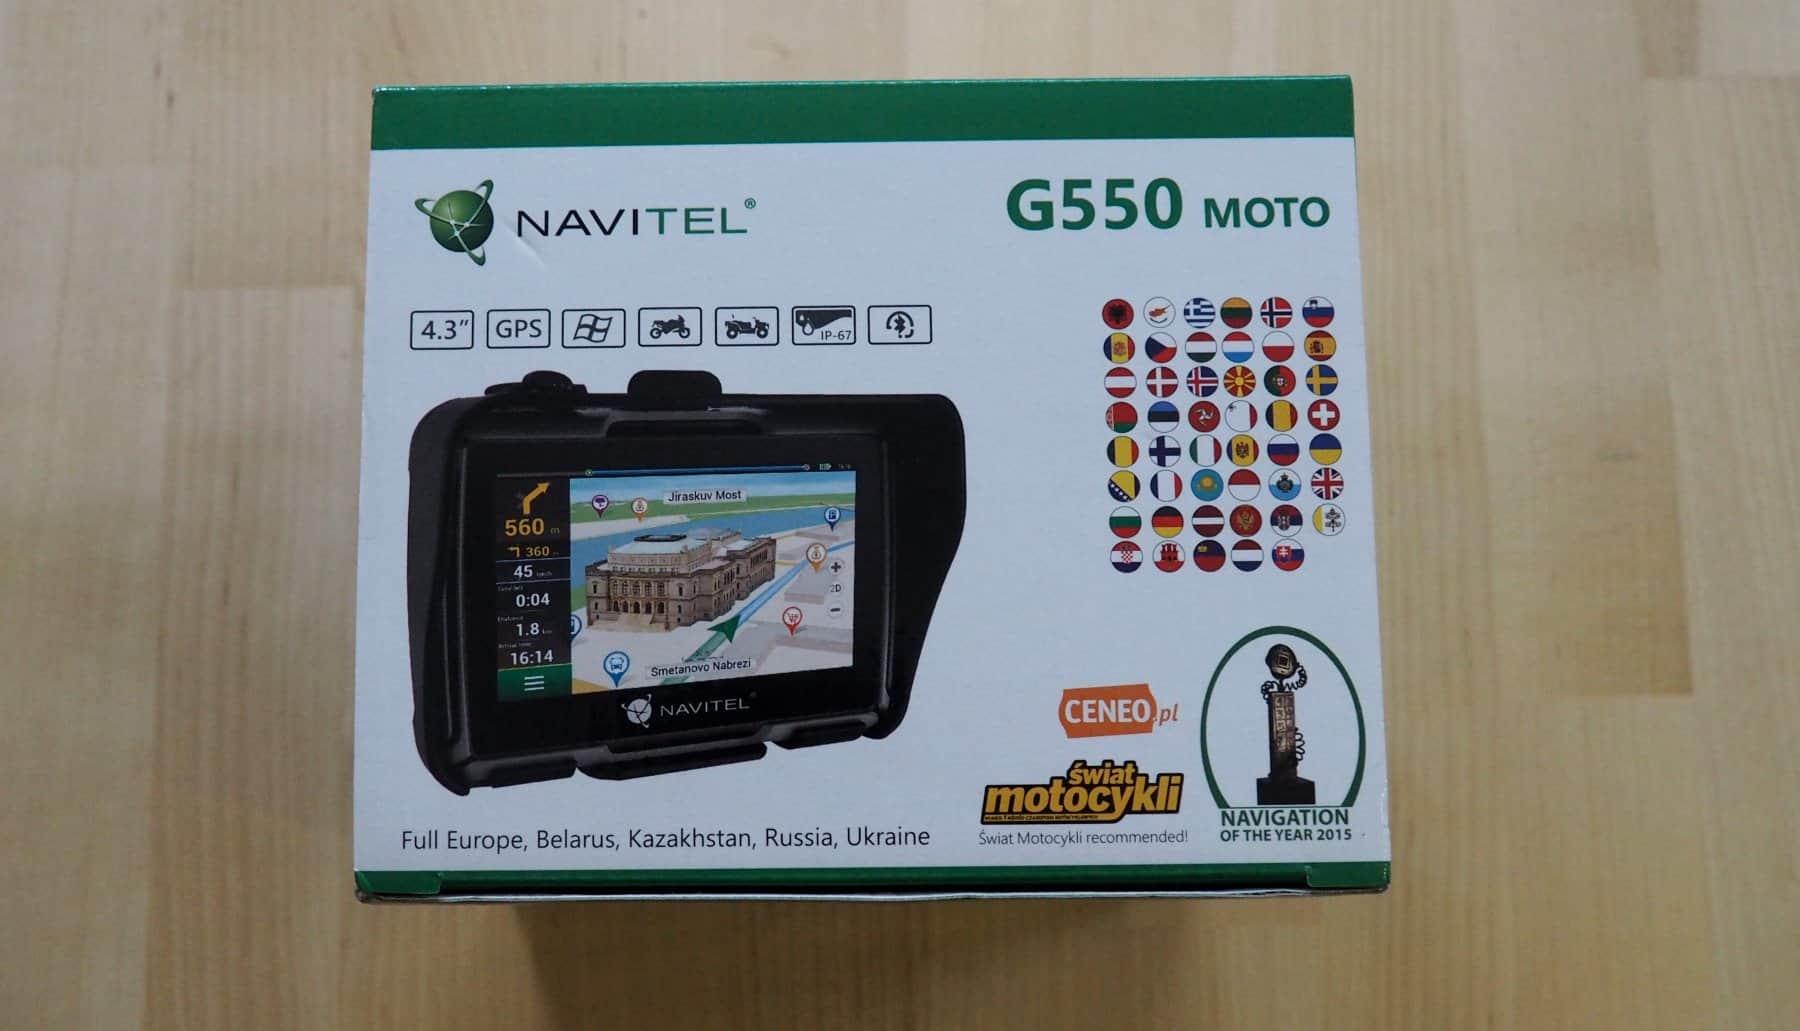 Navitel G550 Moto – puikus navigatorius